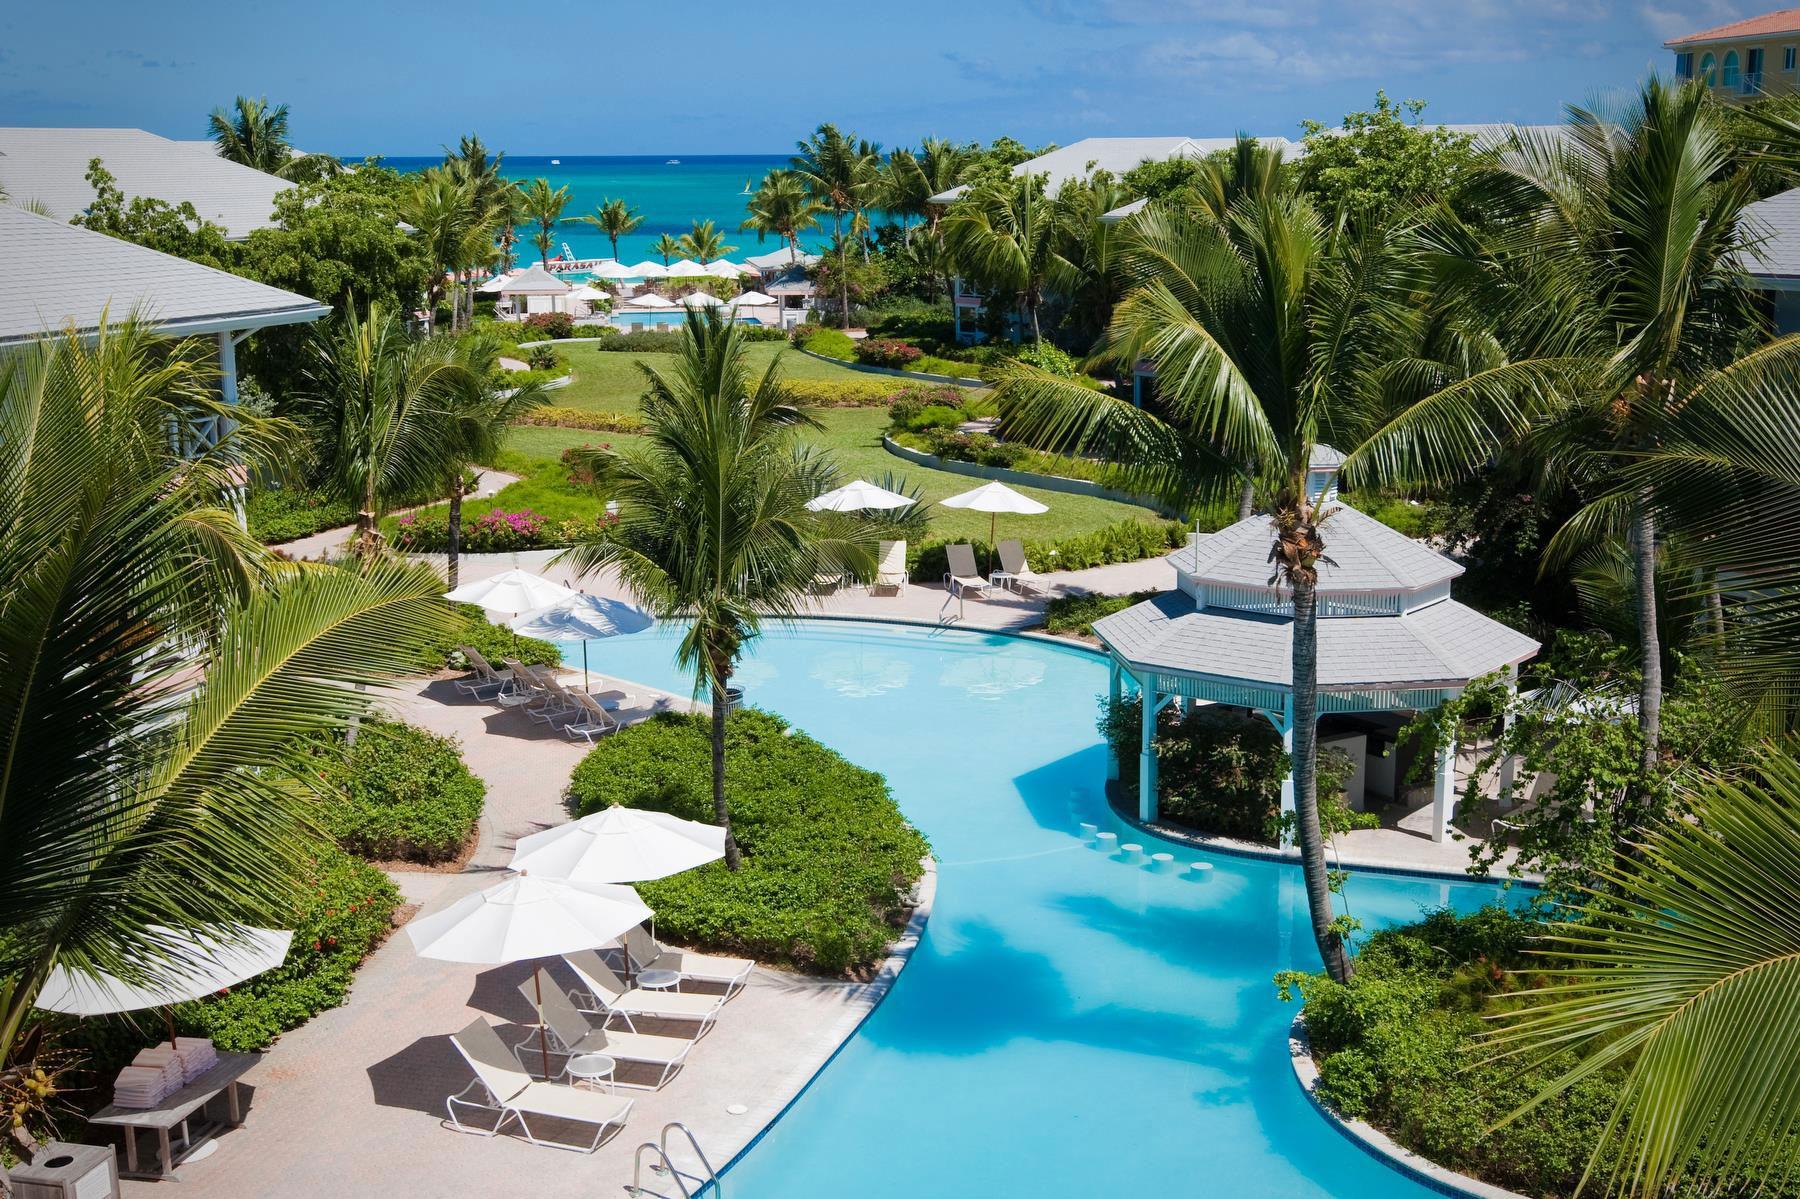 Ocean Club resort pool